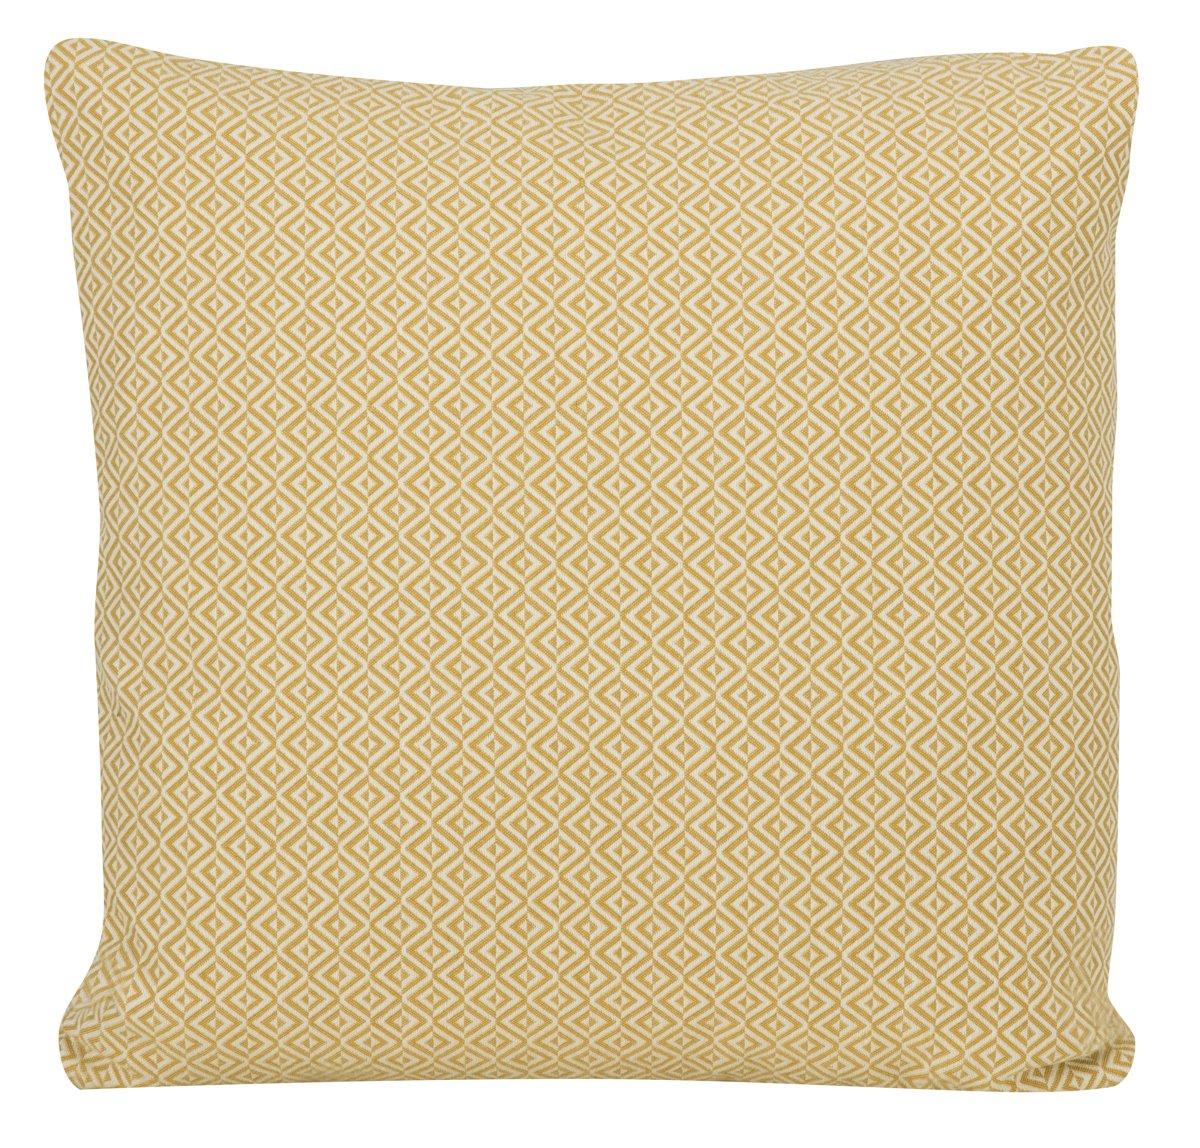 Pompeii Yellow Fabric Square Accent Pillow